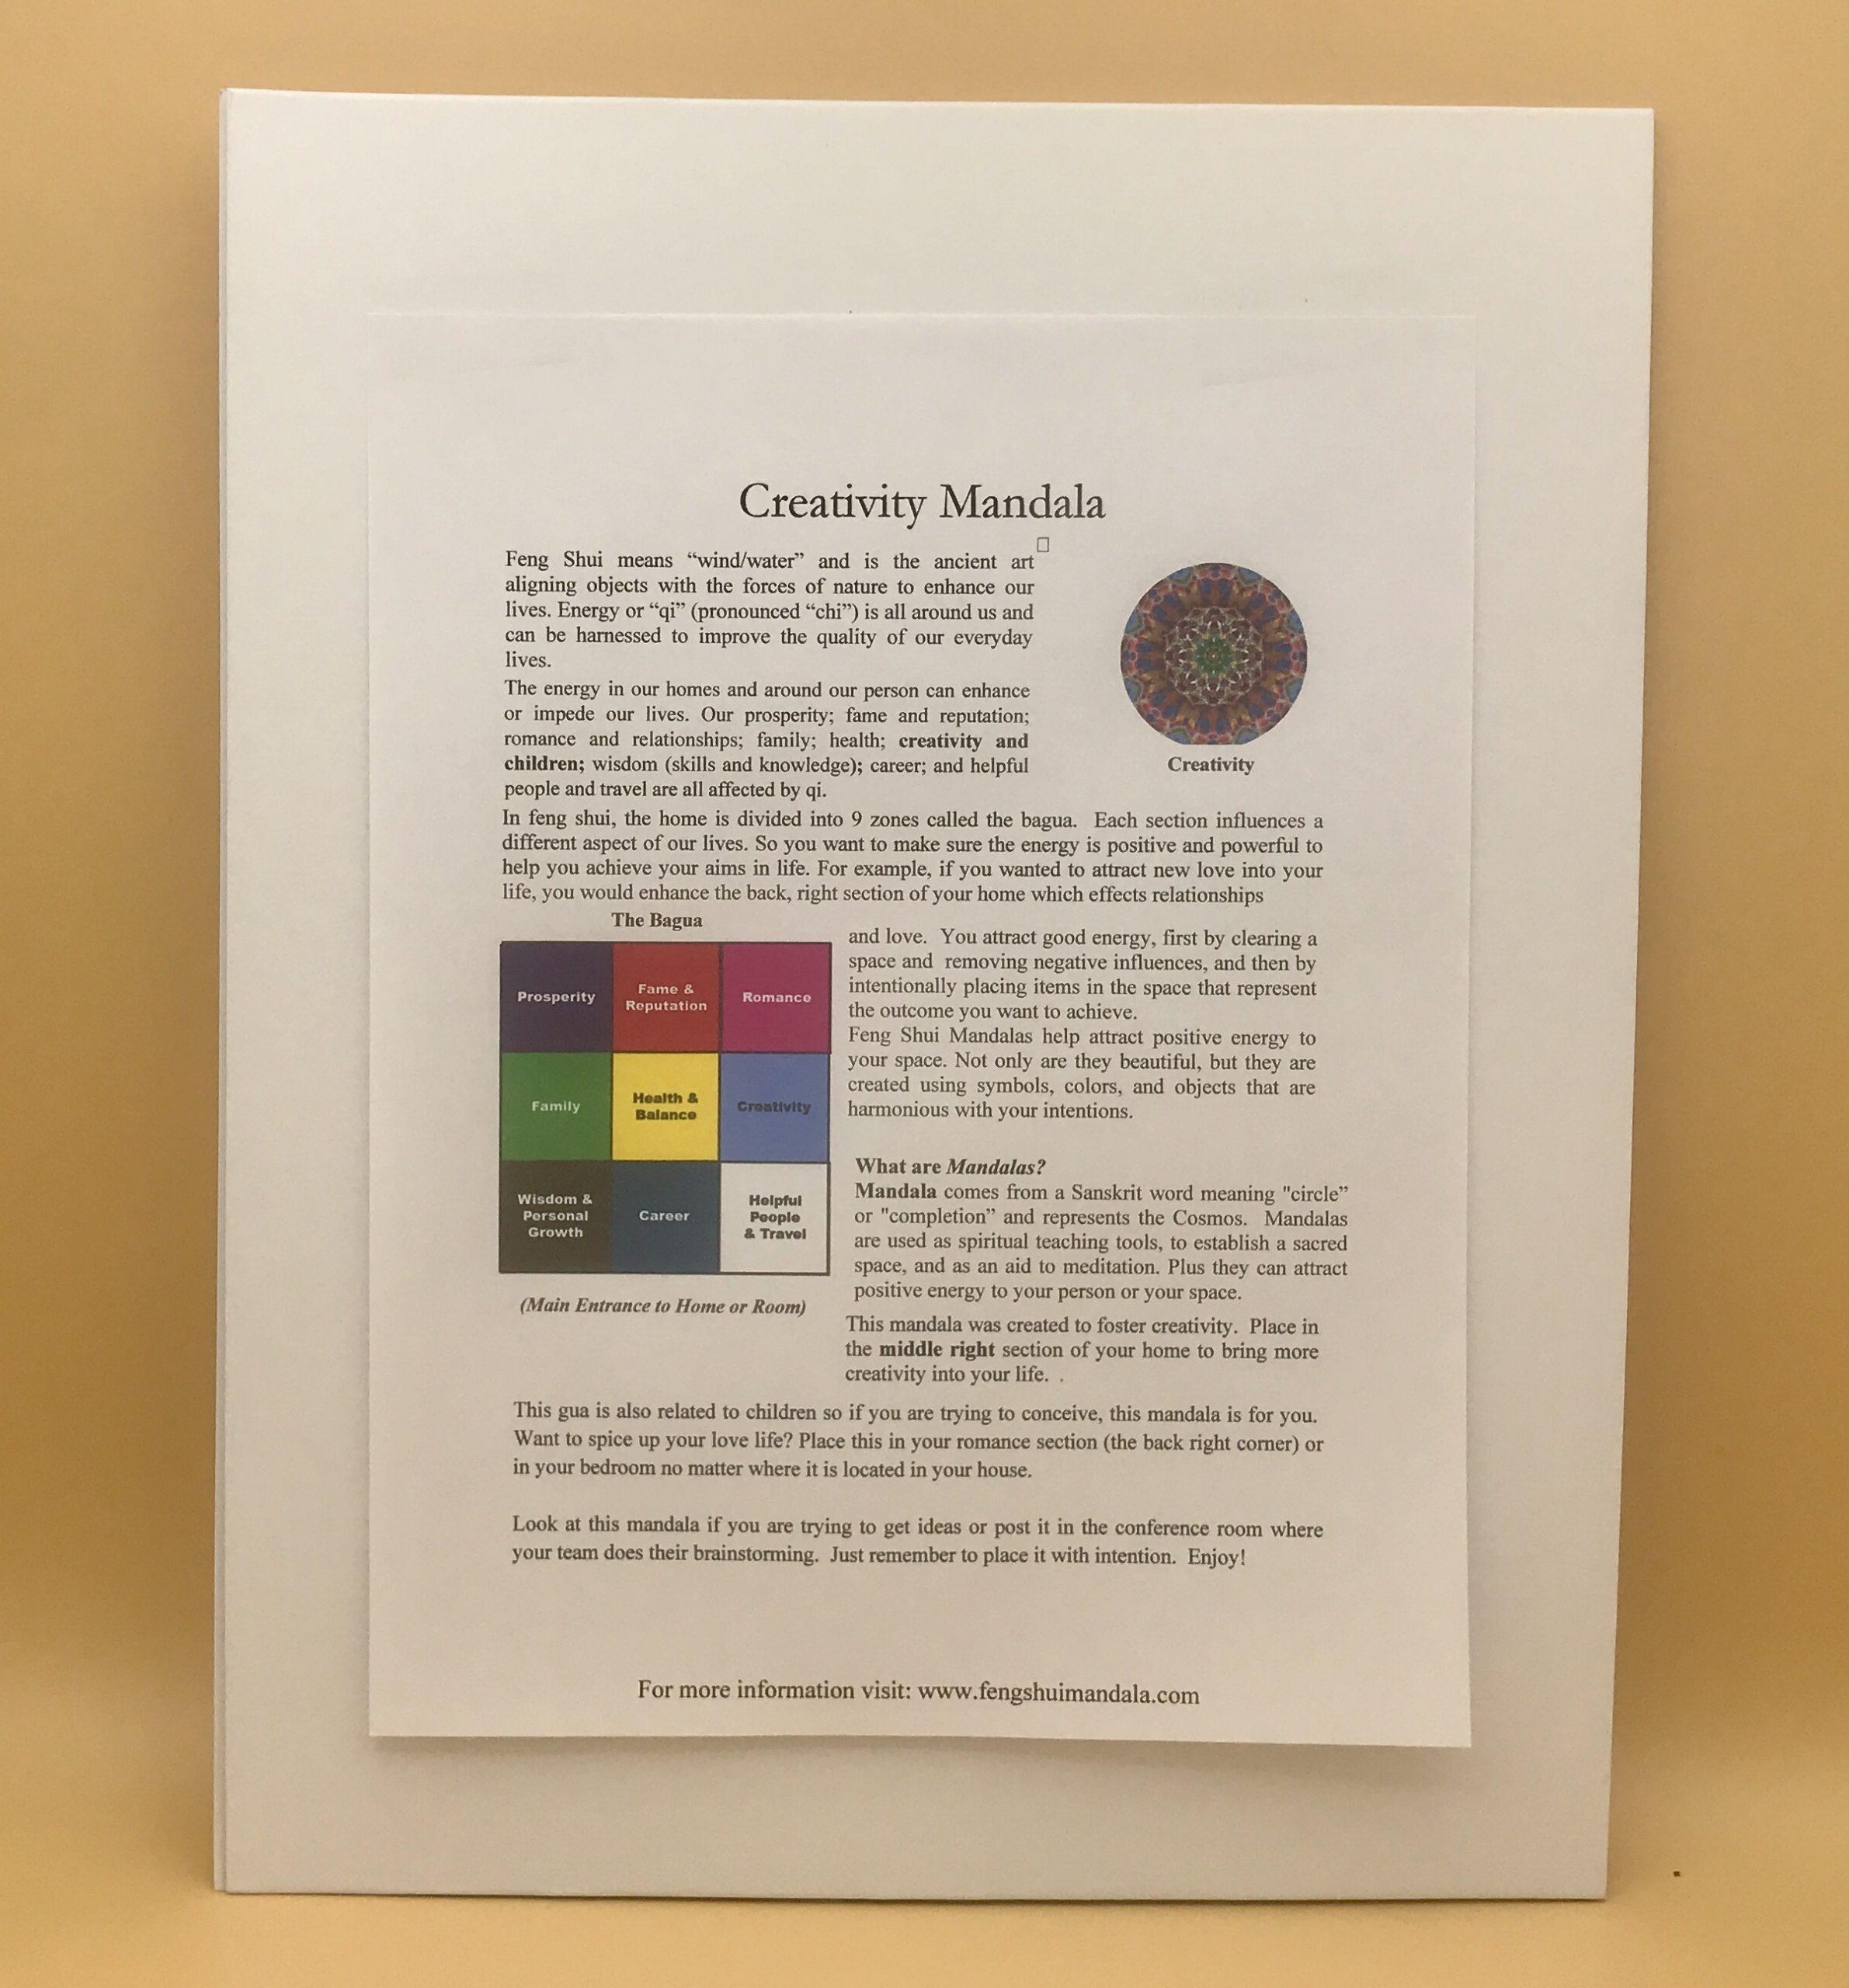 Creativity and Children Mandala Framed Print